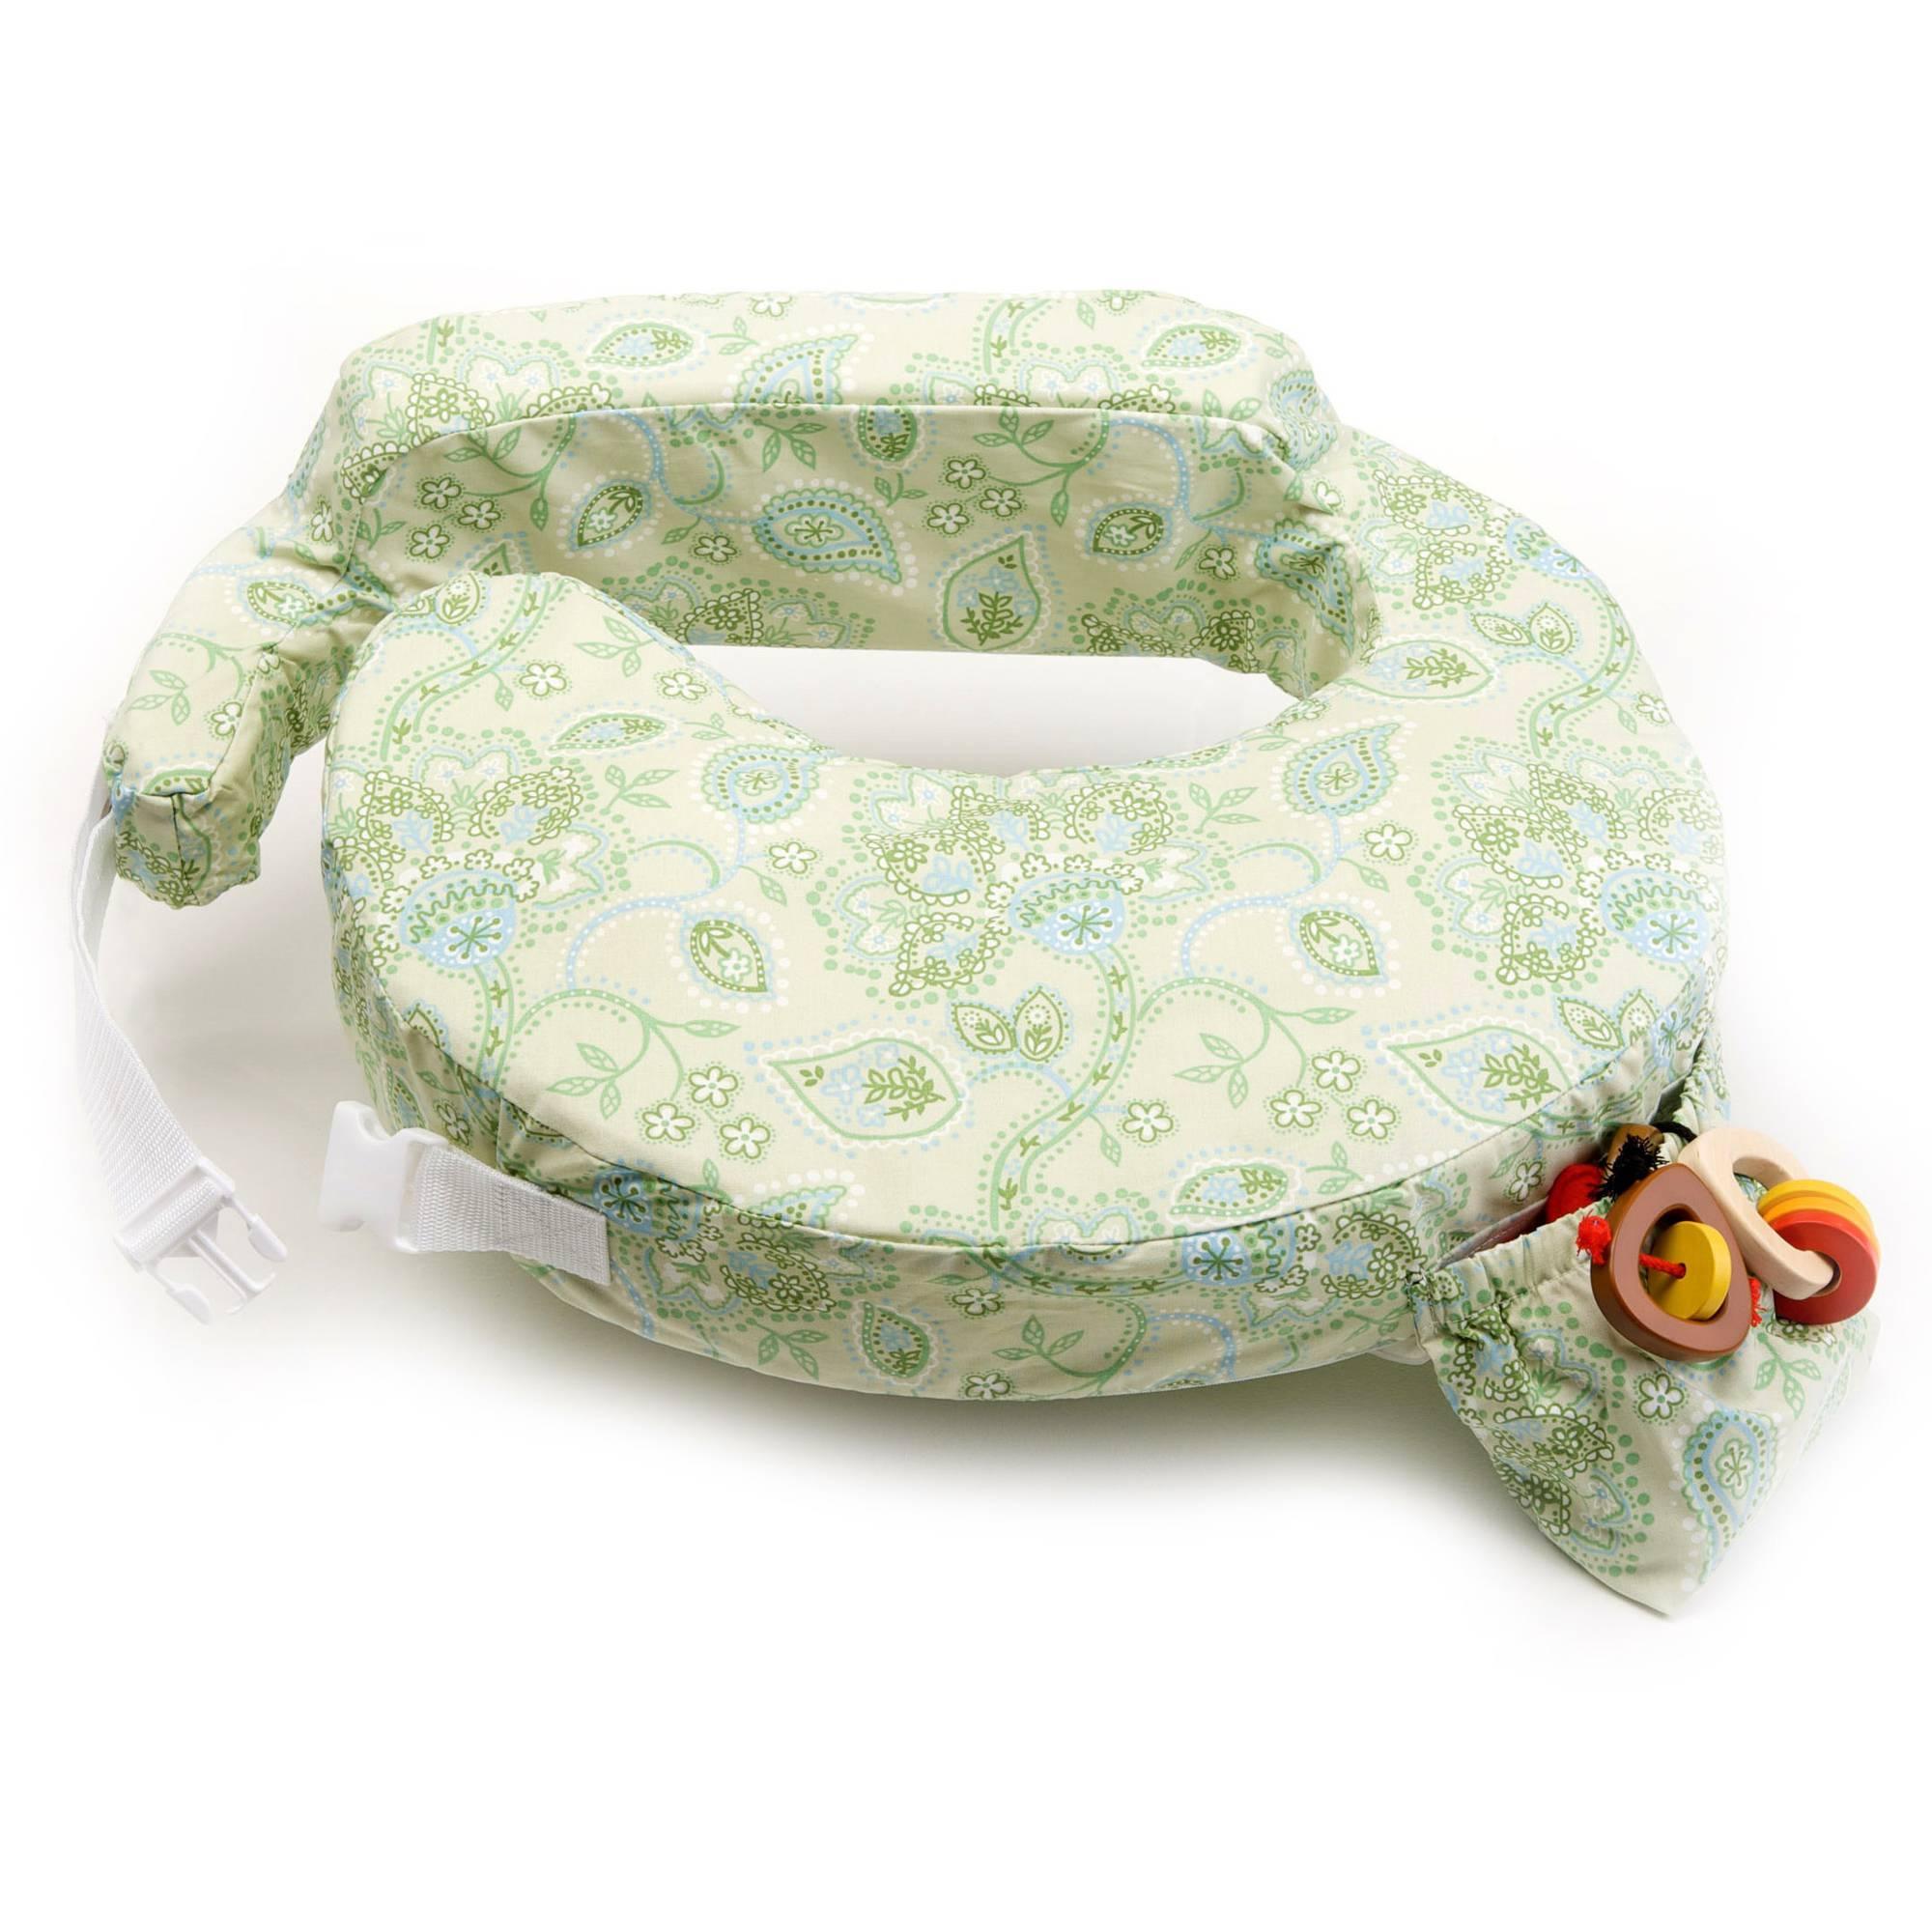 My Brest Friend - Inflatable Travel Nursing Pillow